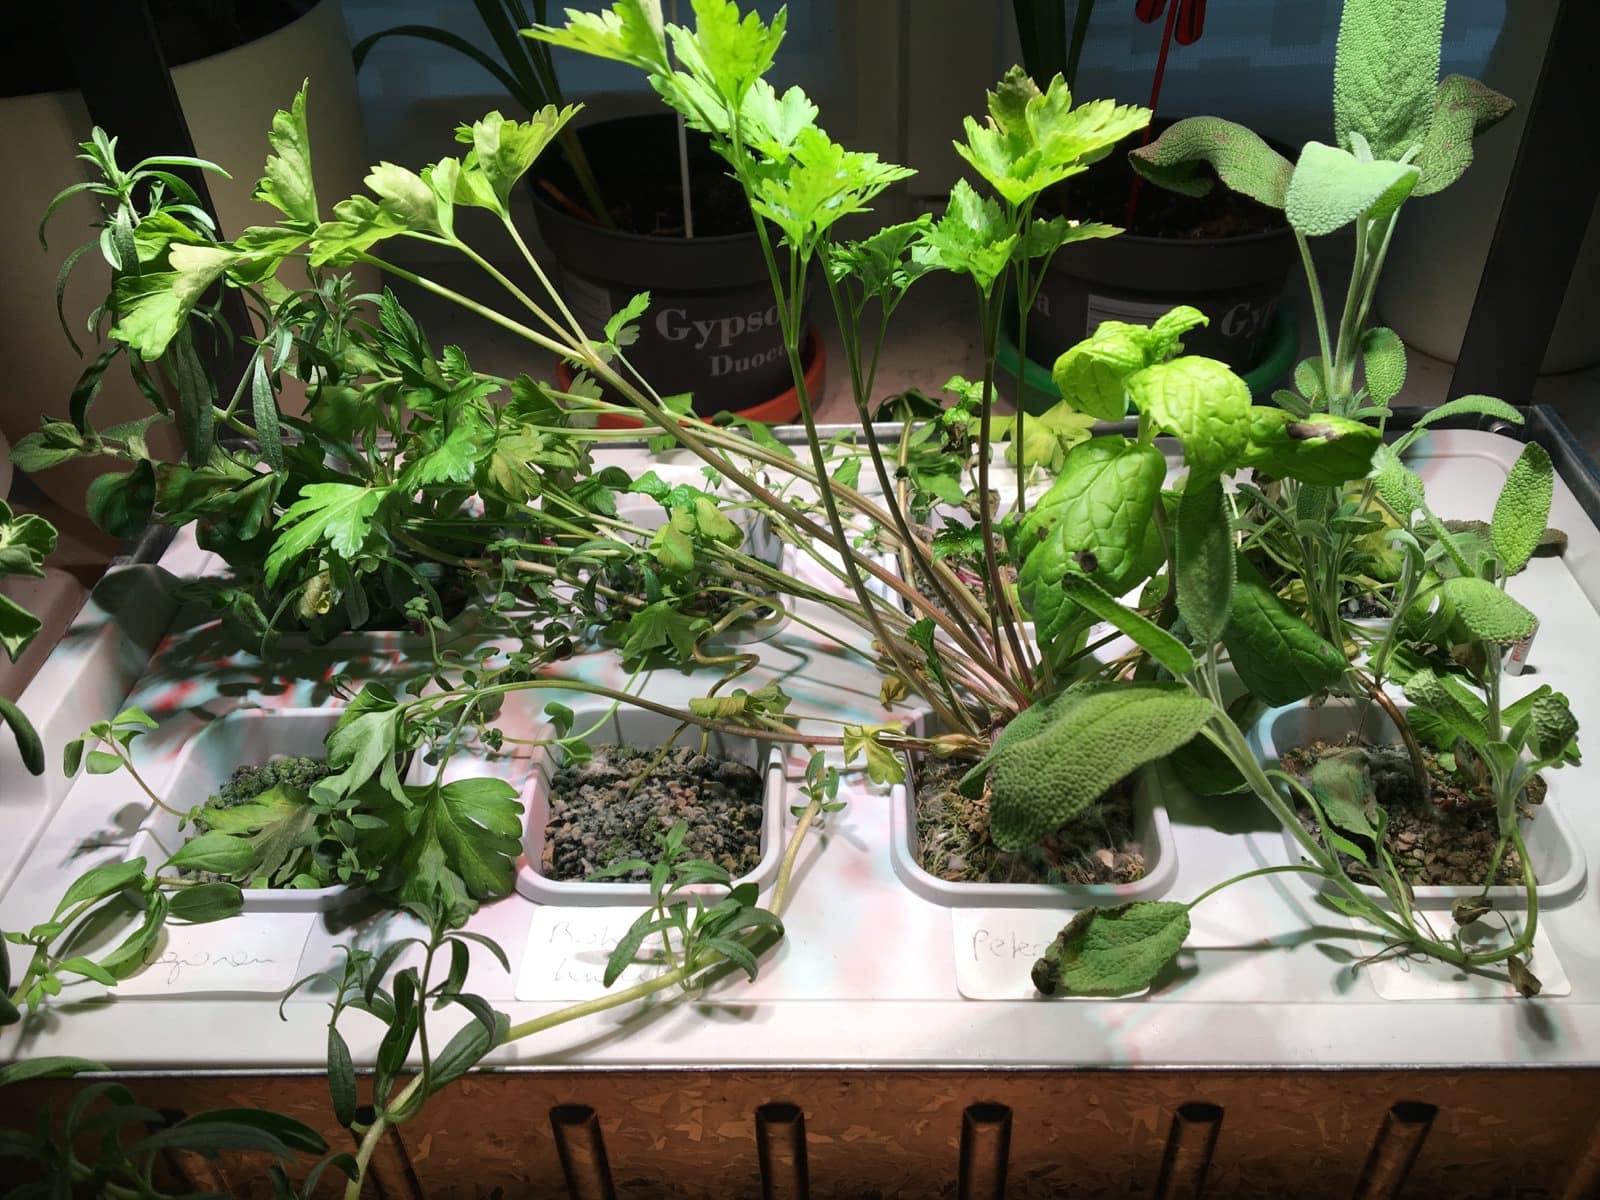 Ikea v xer hydrokultursystem remixed kr uter teil 2 for Ikea kunstliche pflanzen